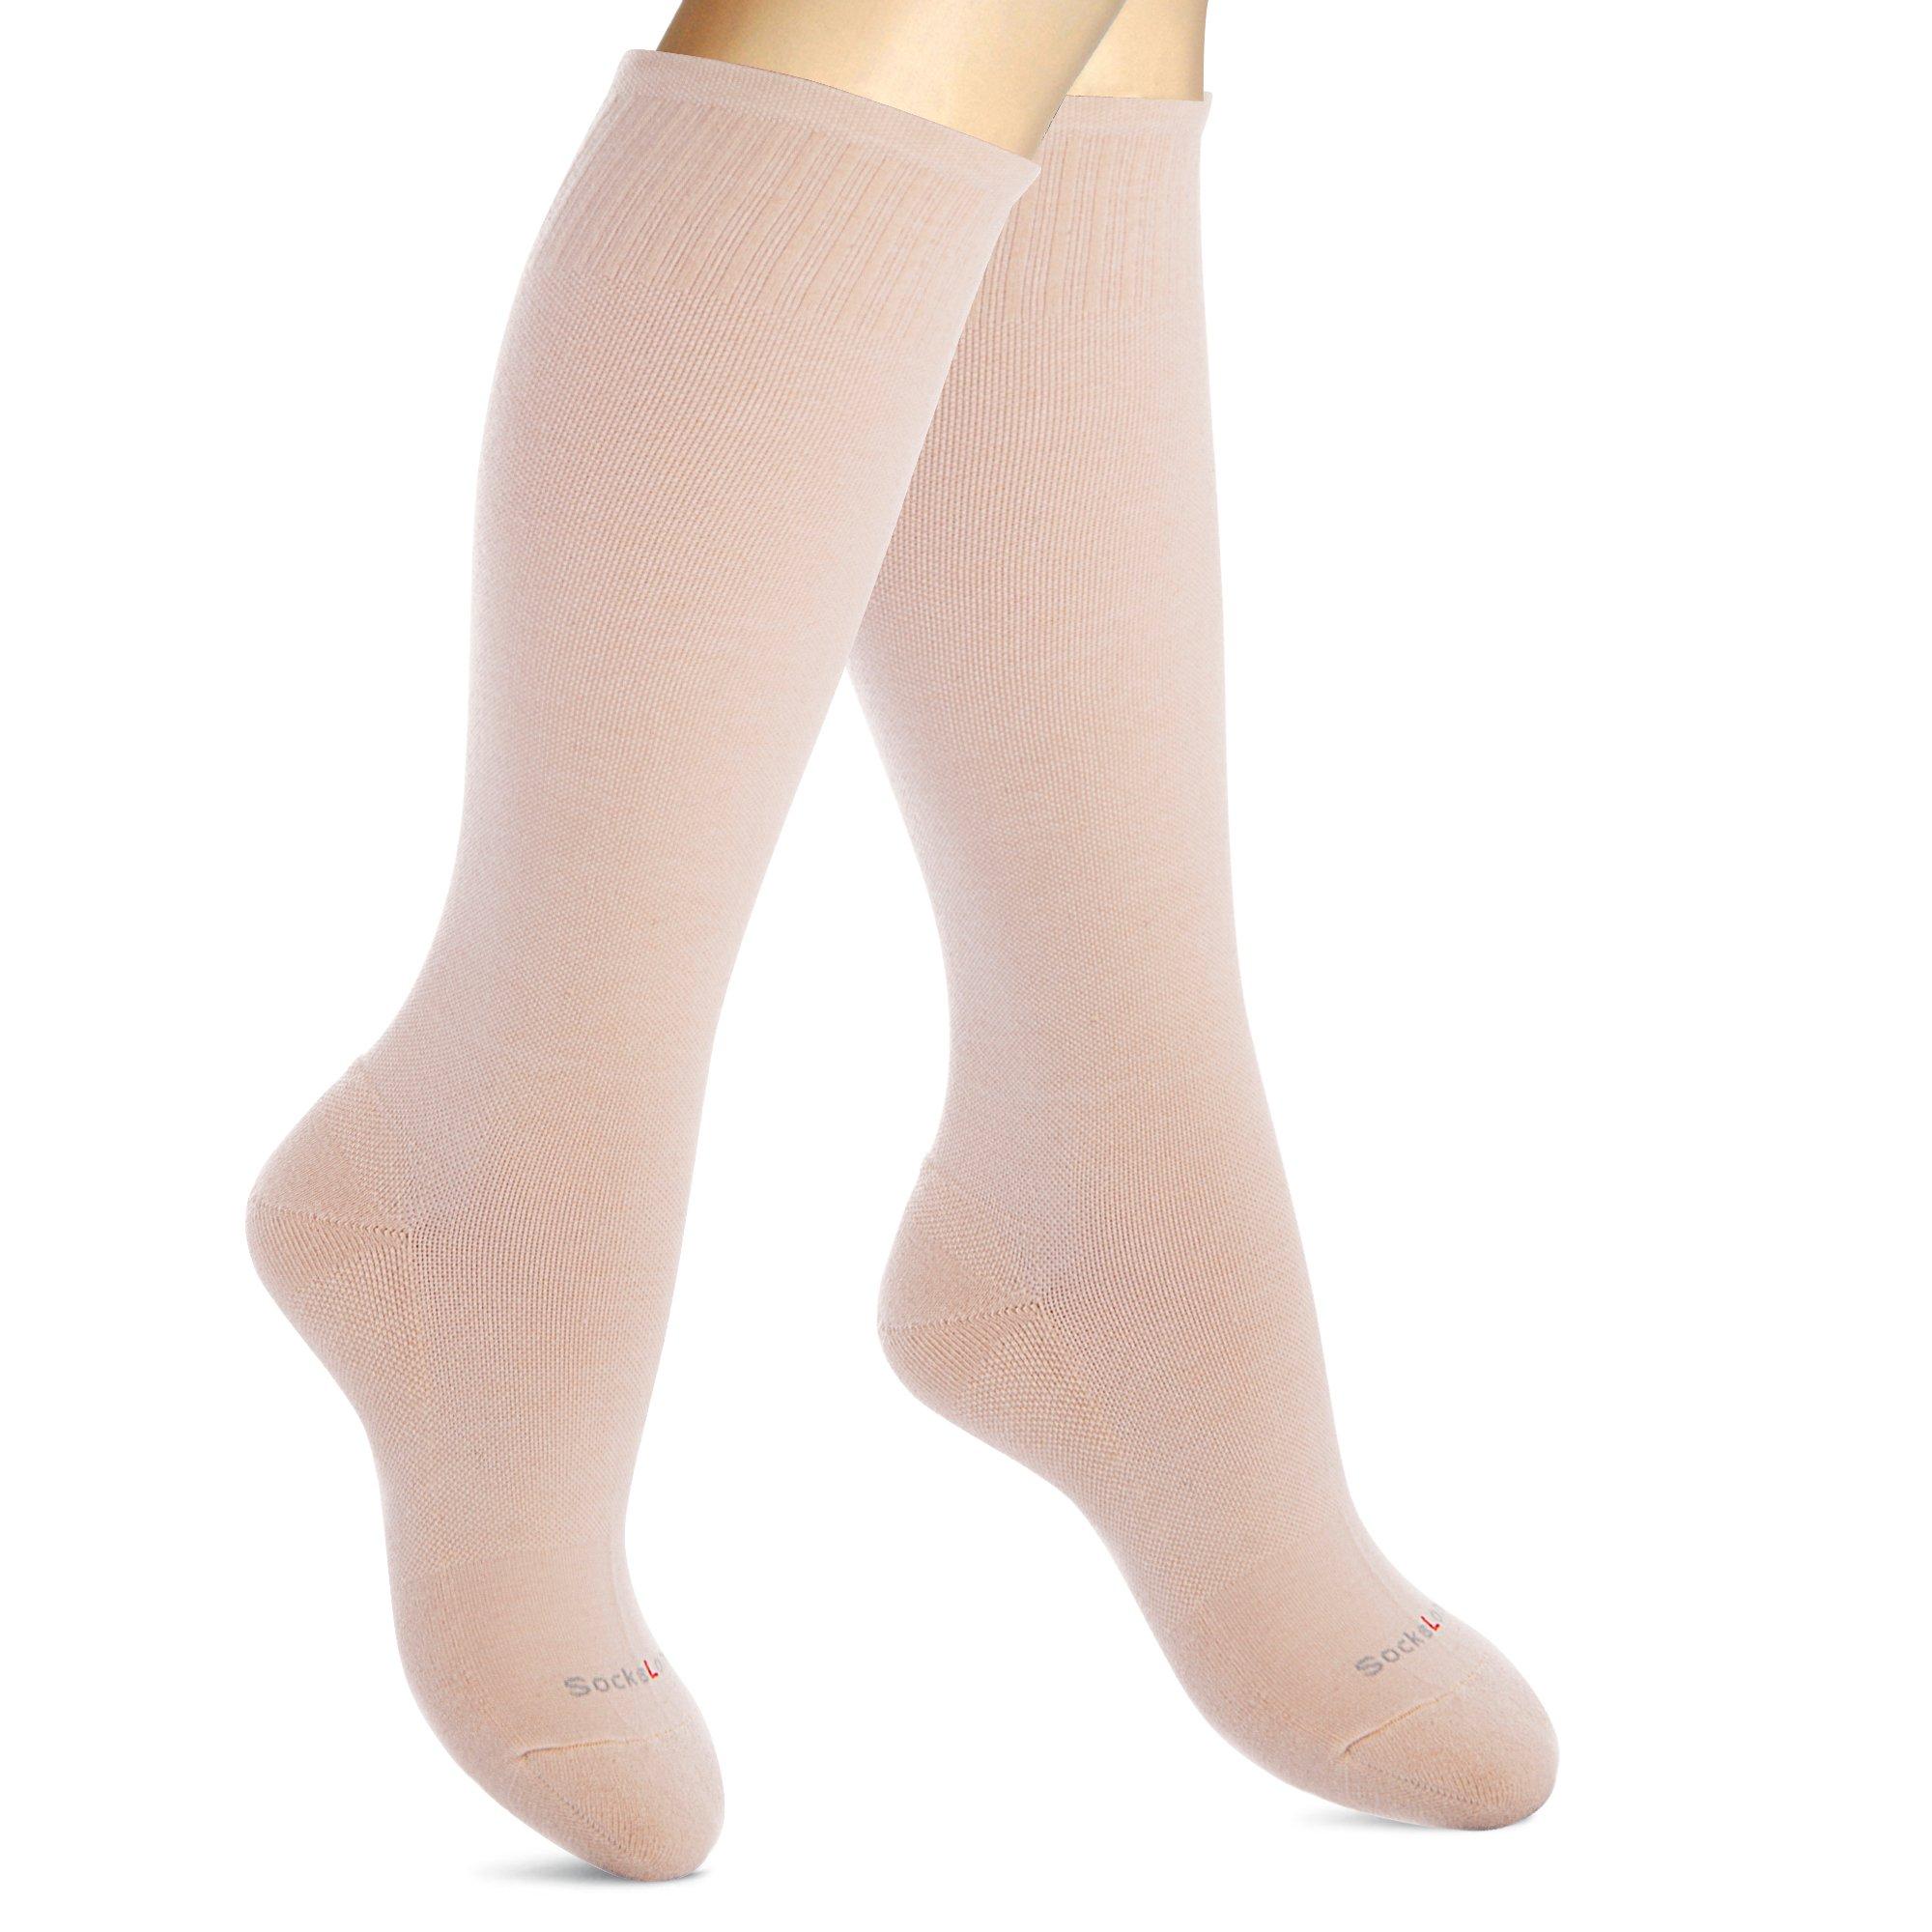 ea877a3a61 Cotton Compression Socks for Women. Graduated Stockings for Nurses,  Maternity, Travel, Flight